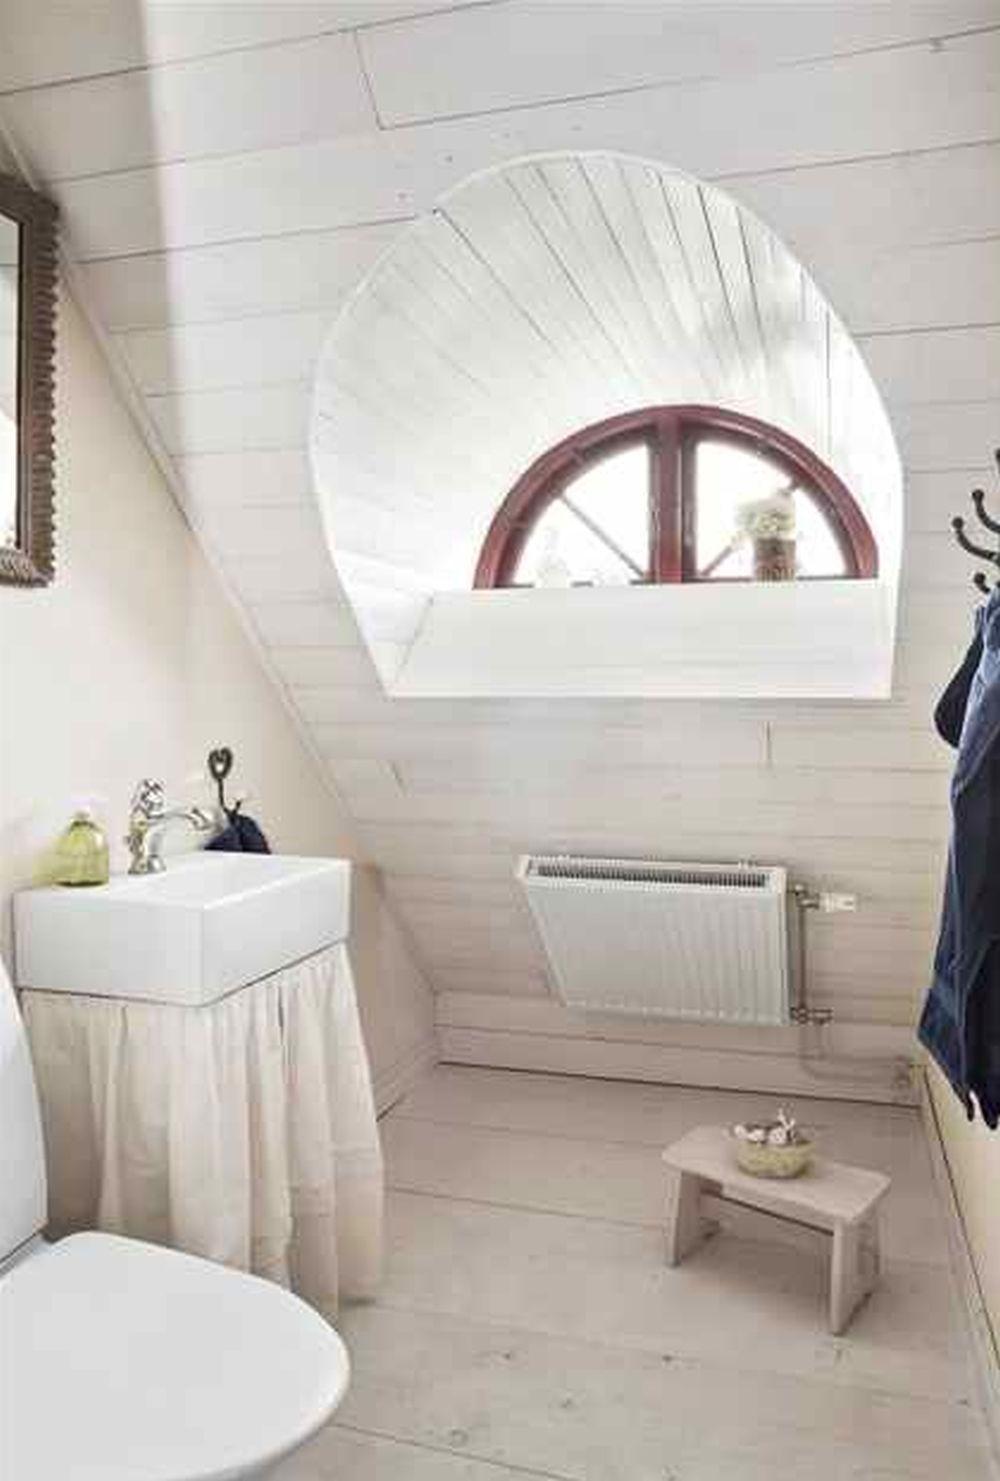 adelaparvu.com despre casa rustica Suedia, casa noua care pare veche, Foto Mats Svensson (35)